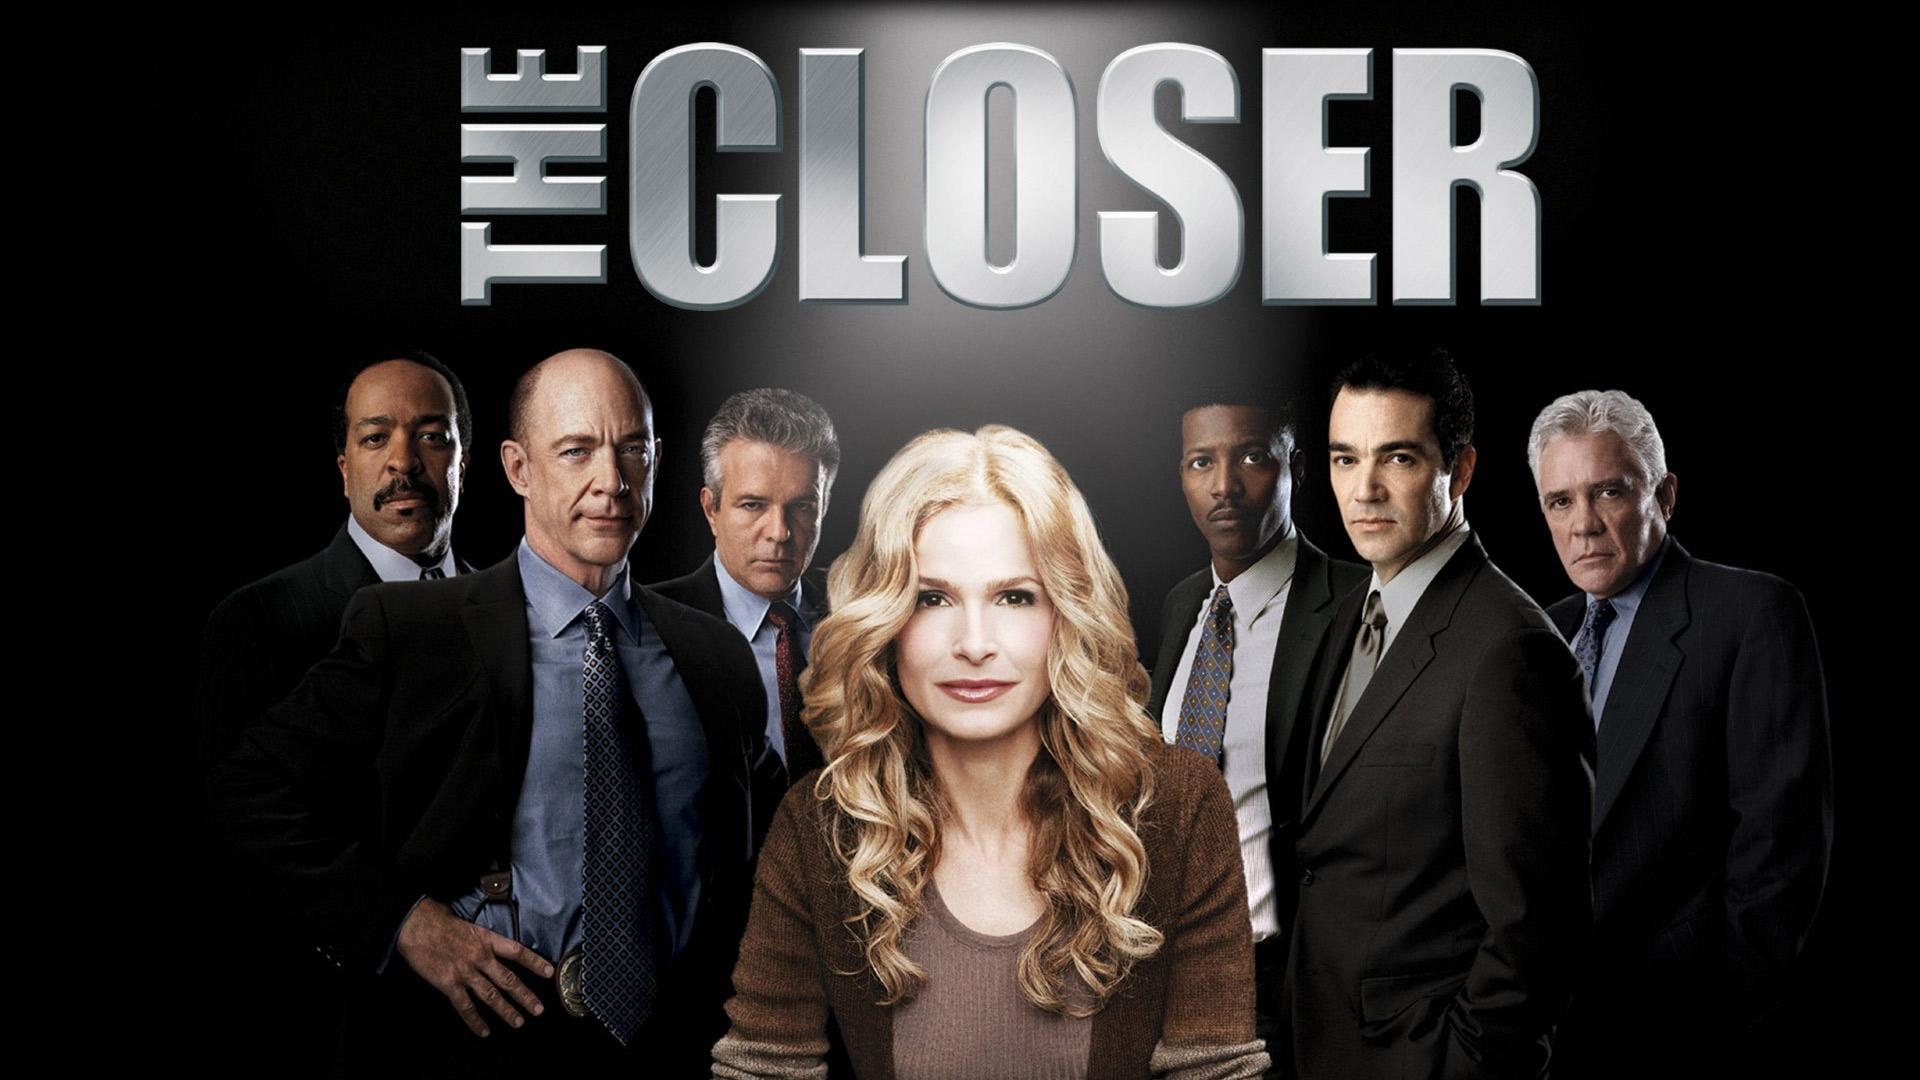 The Closer - Staffel 1 [dt./OV]